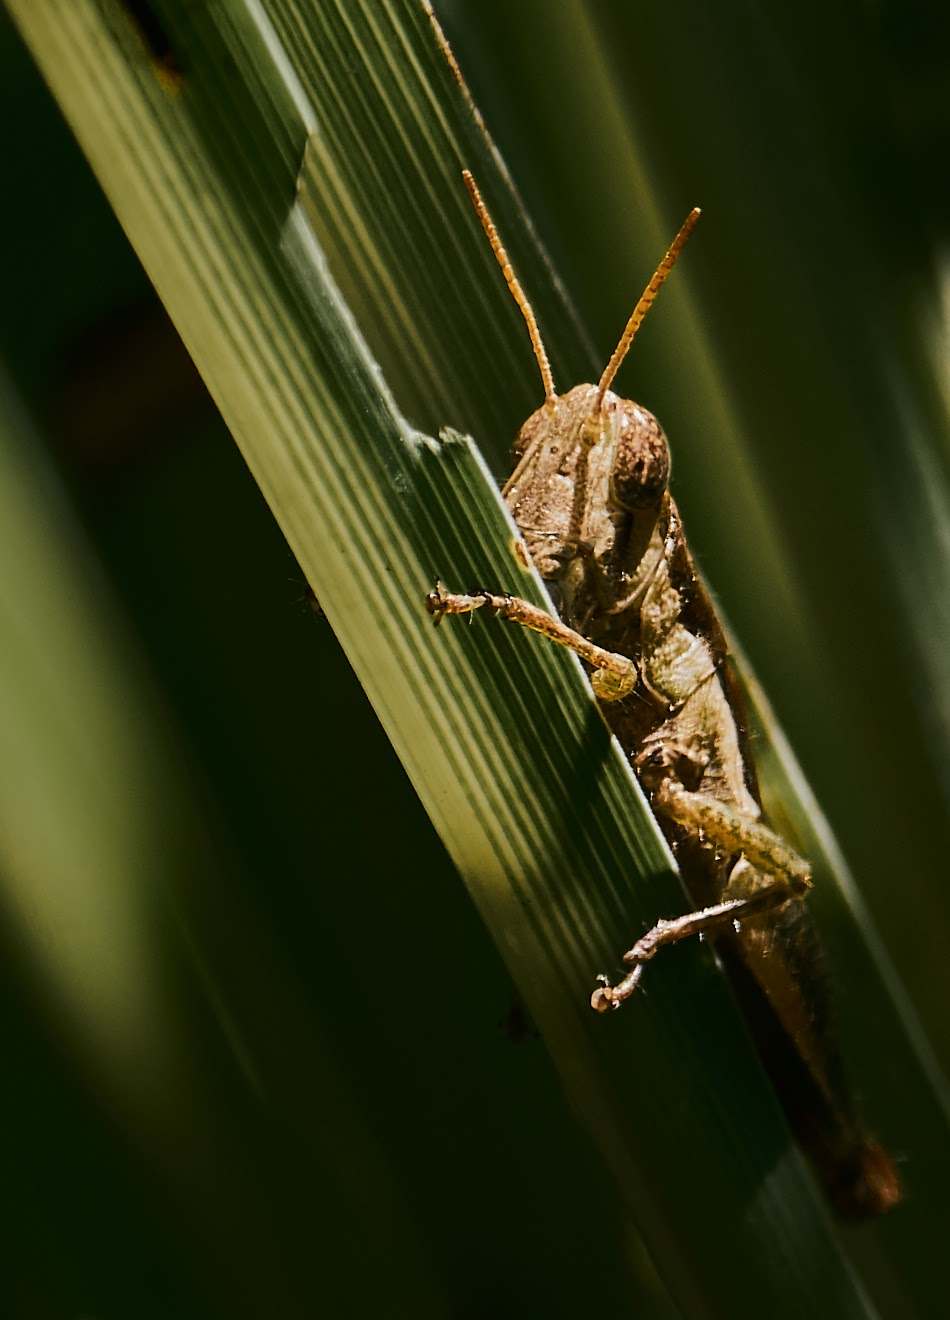 grasshopper,artistic,close-up,Philippines